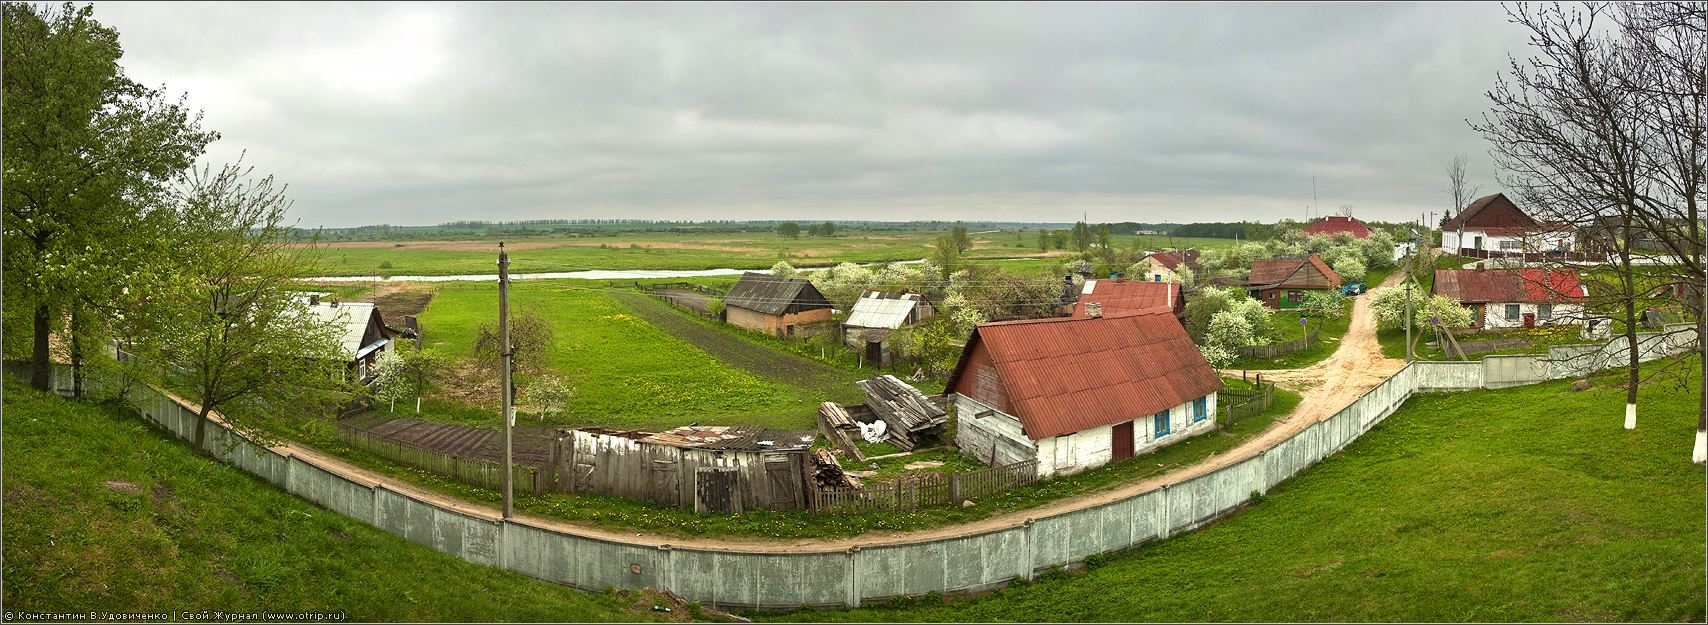 4282-4291-8154x2990s_2.jpg - Беларусь 2010 (01-03.05.2010)